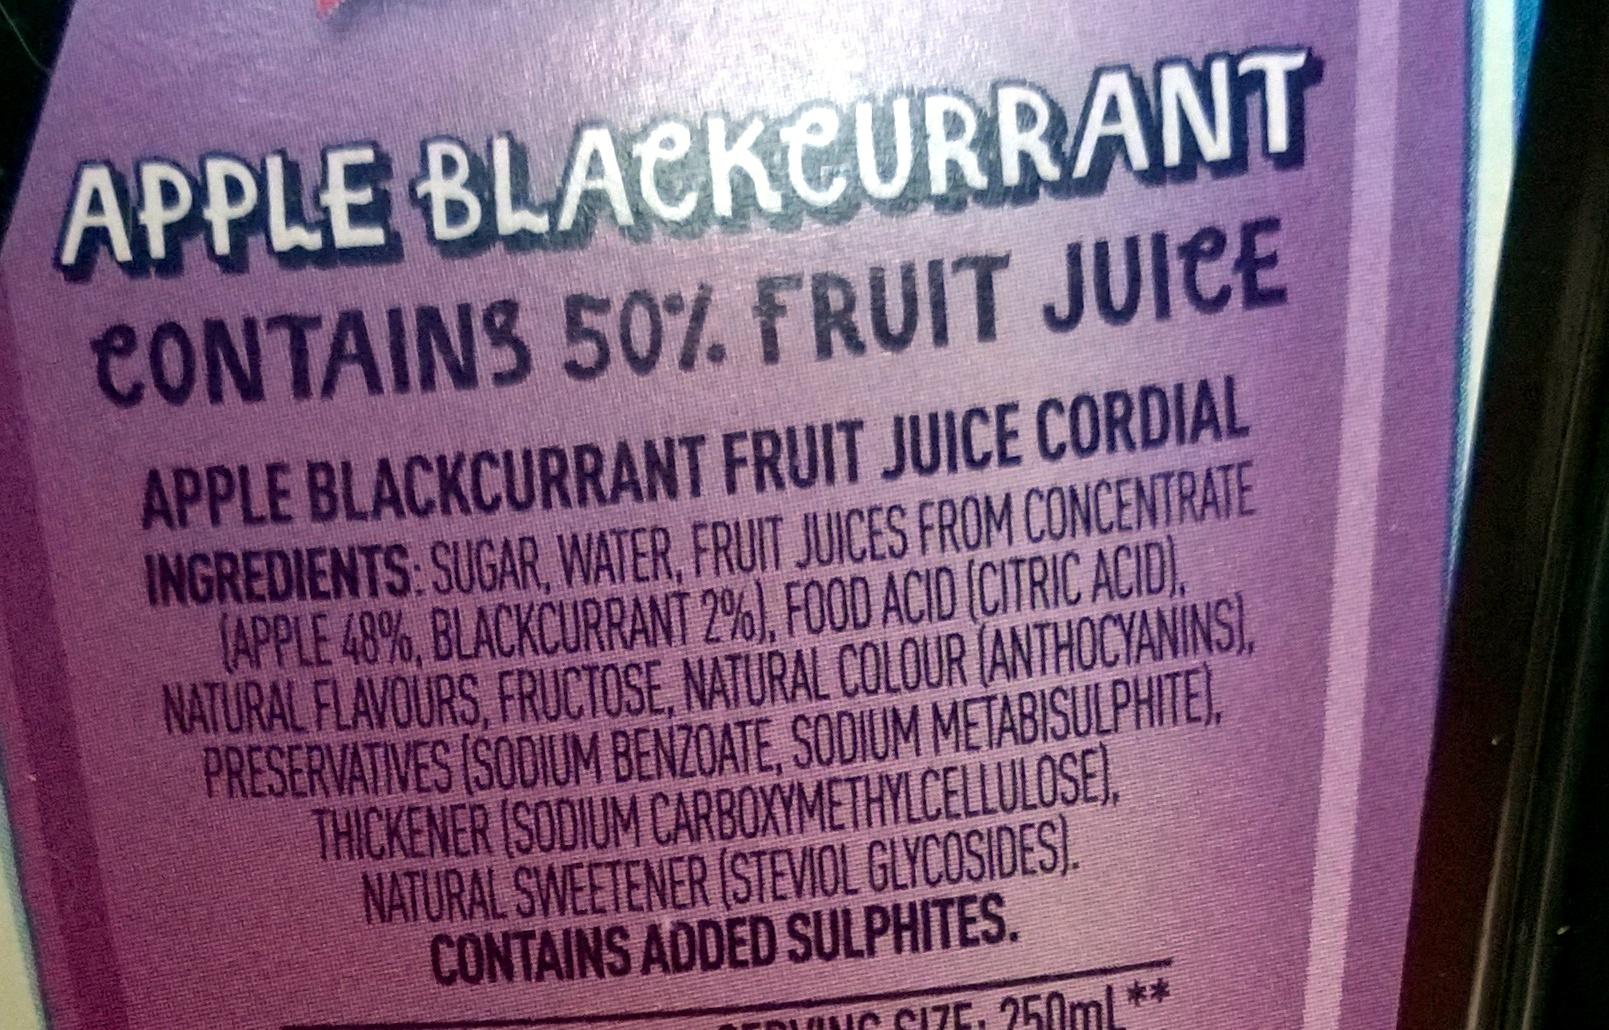 Apple blackcurrent fruit juice cordial - Cottee's - 1L